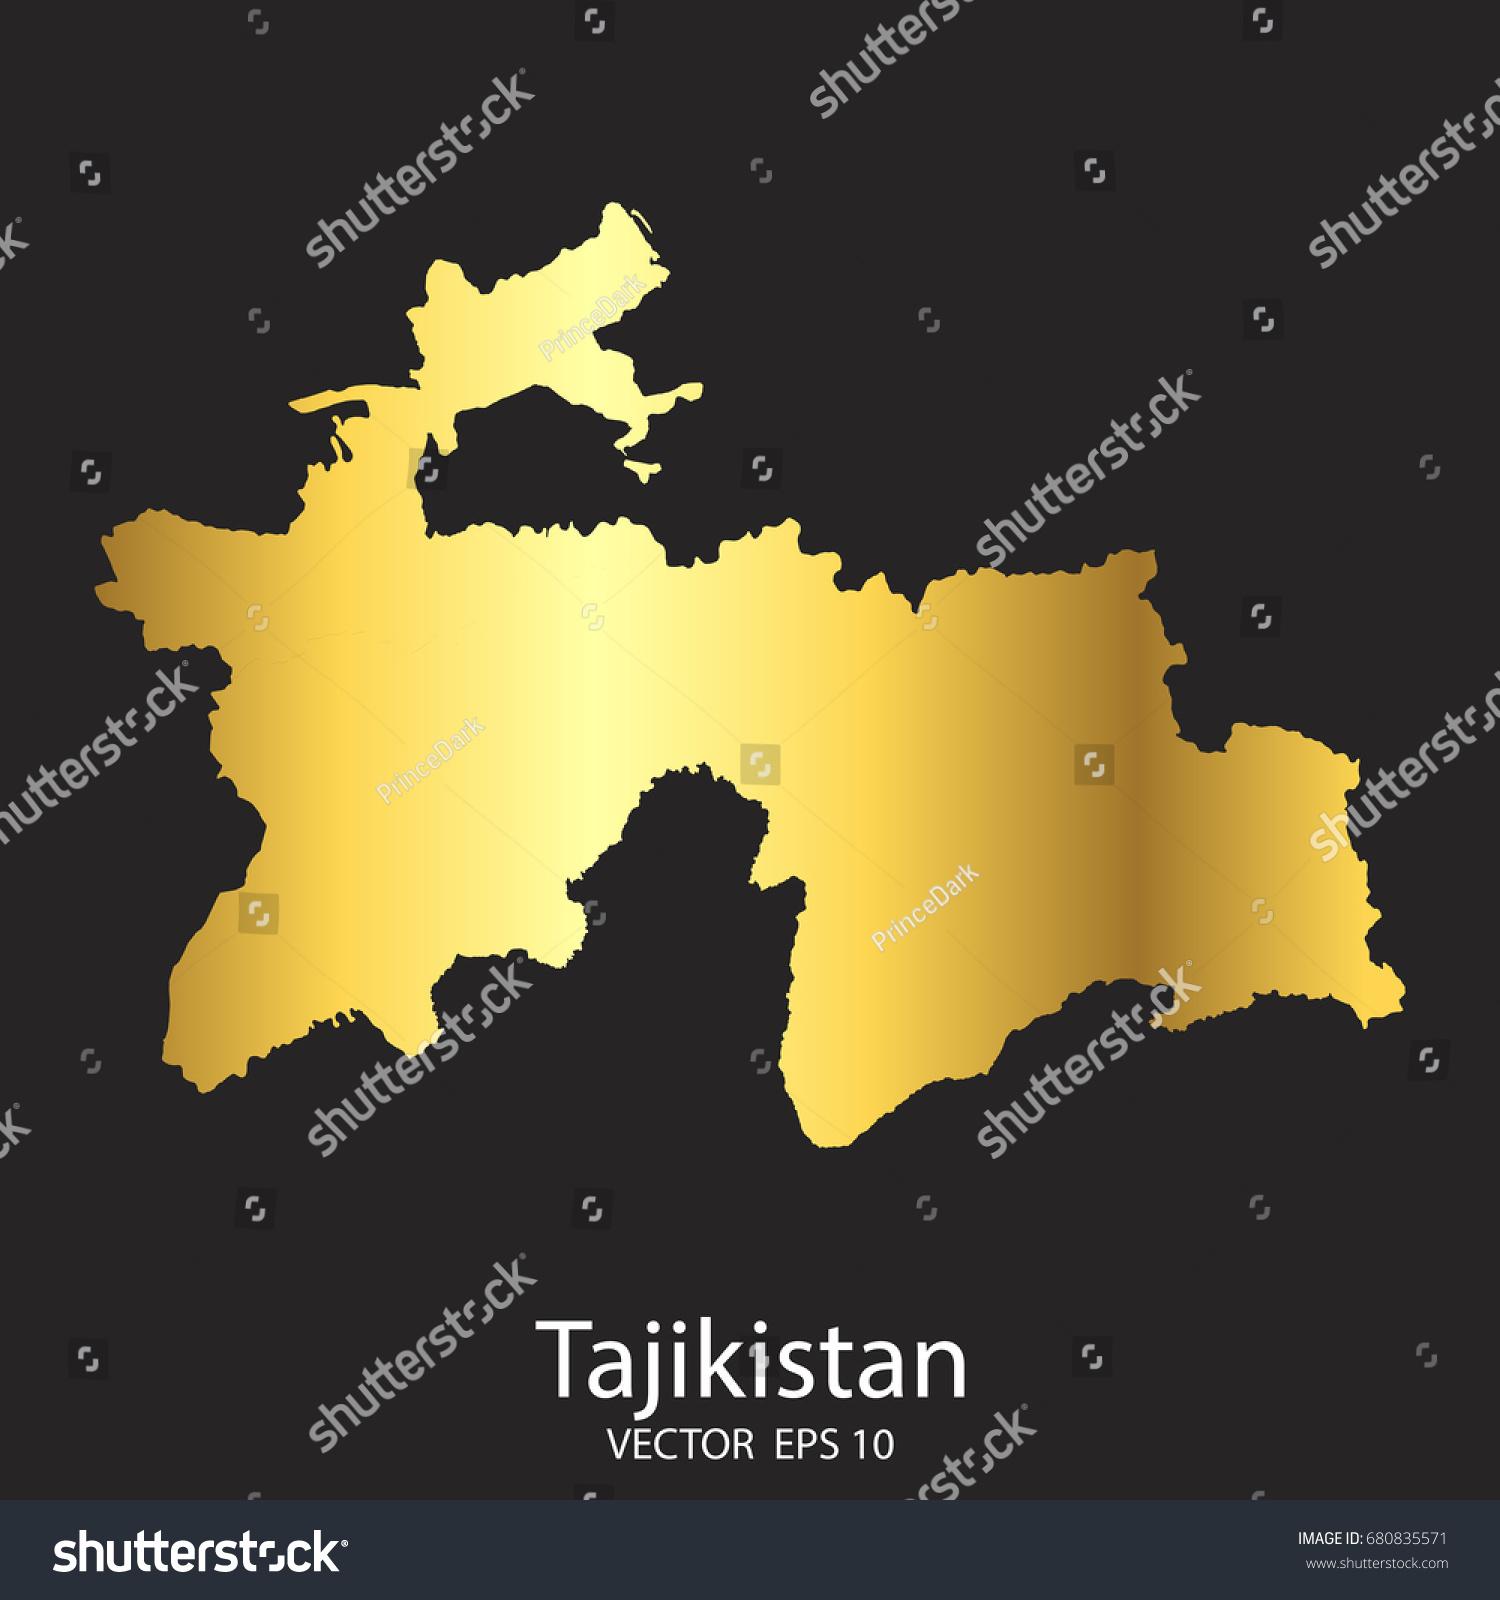 Gold Tajikistan Map Vector Eps Stock Vector - Tajikistan map vector